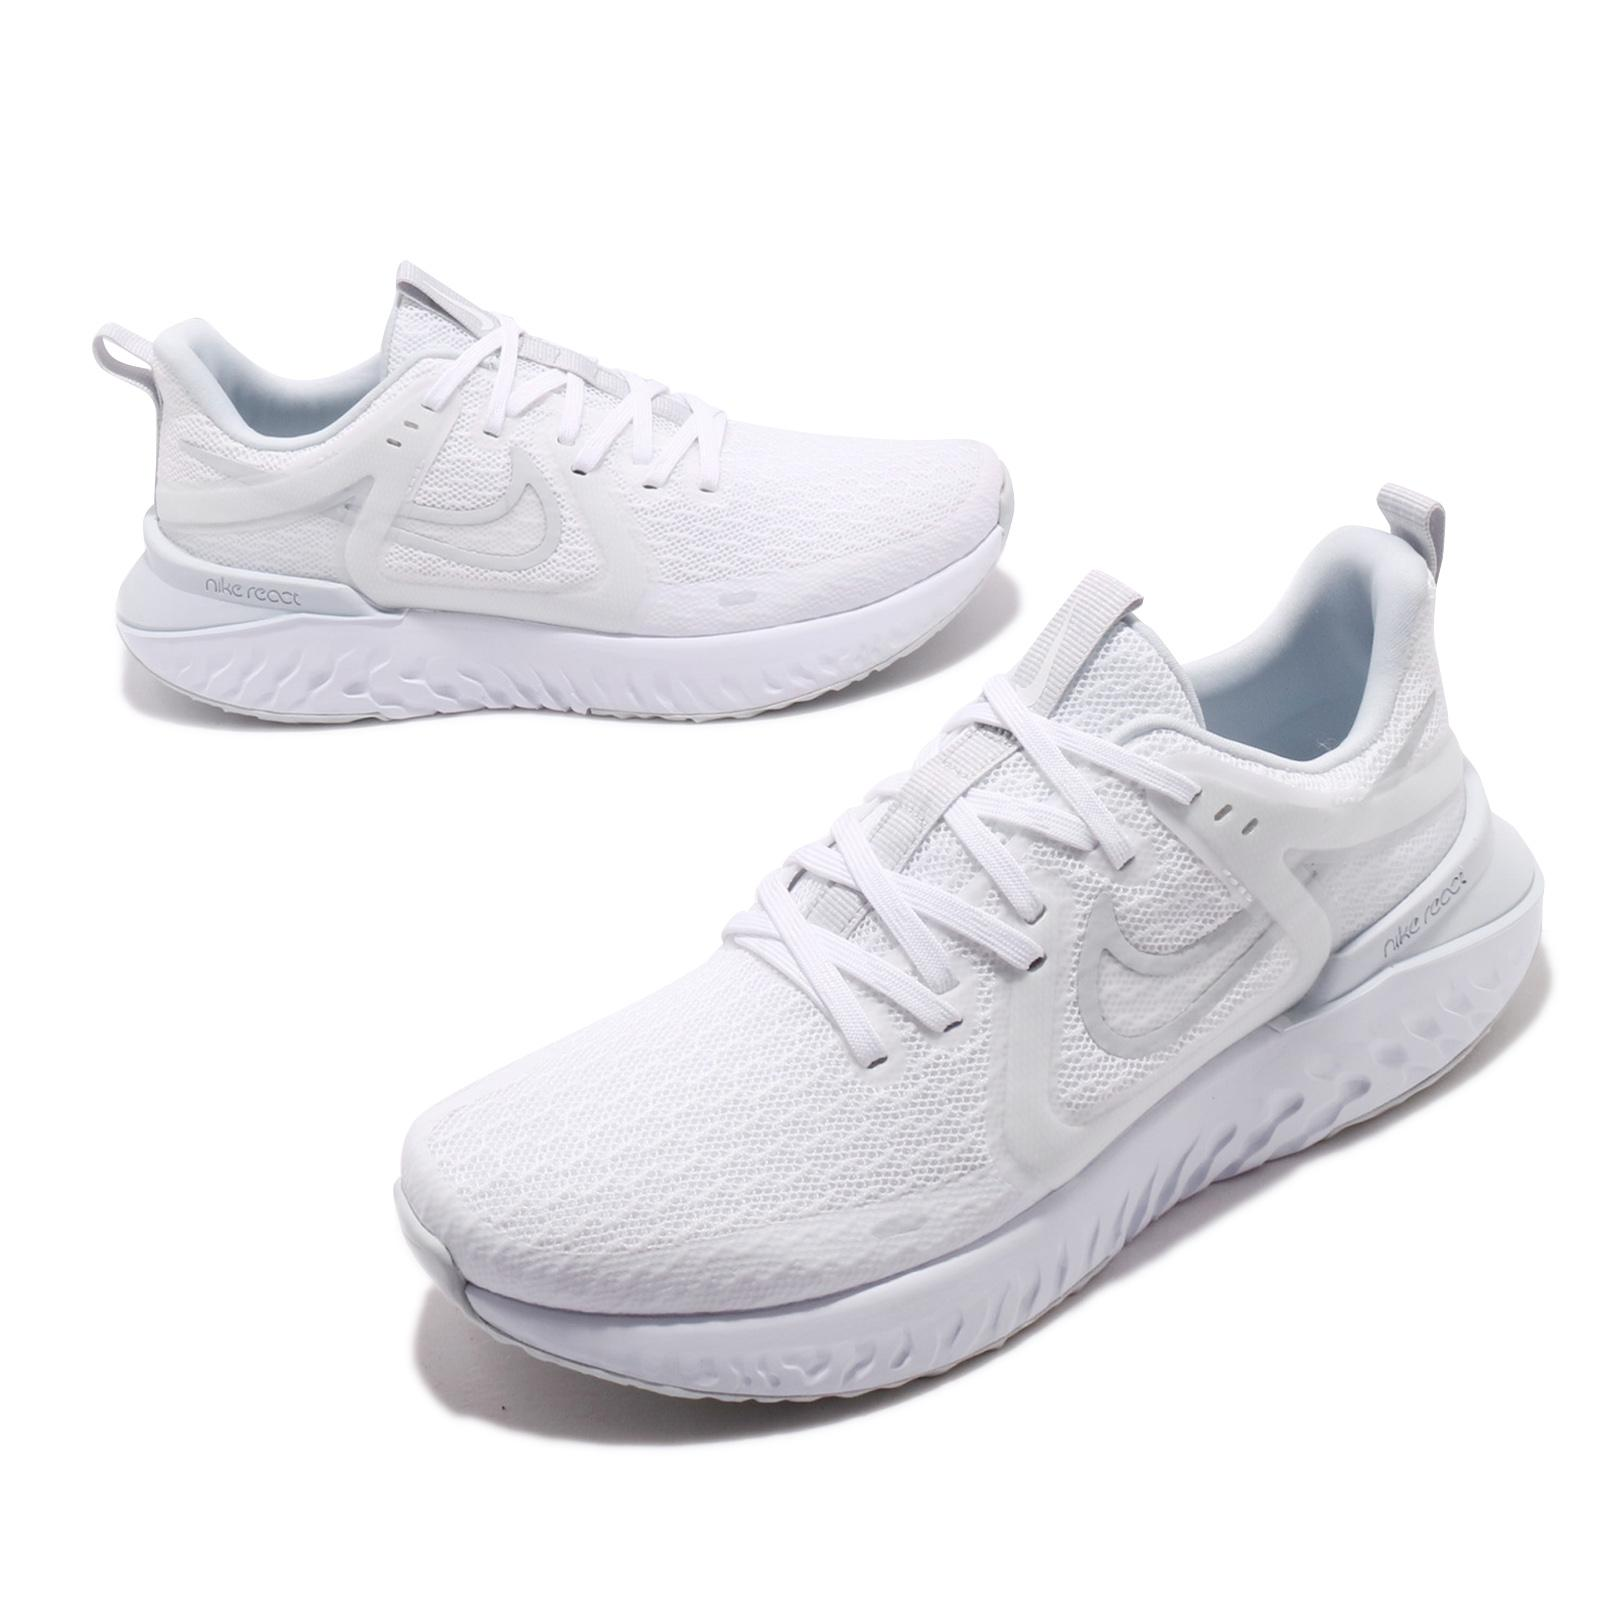 Scarpe donna Nike LEGEND REACT 2 W